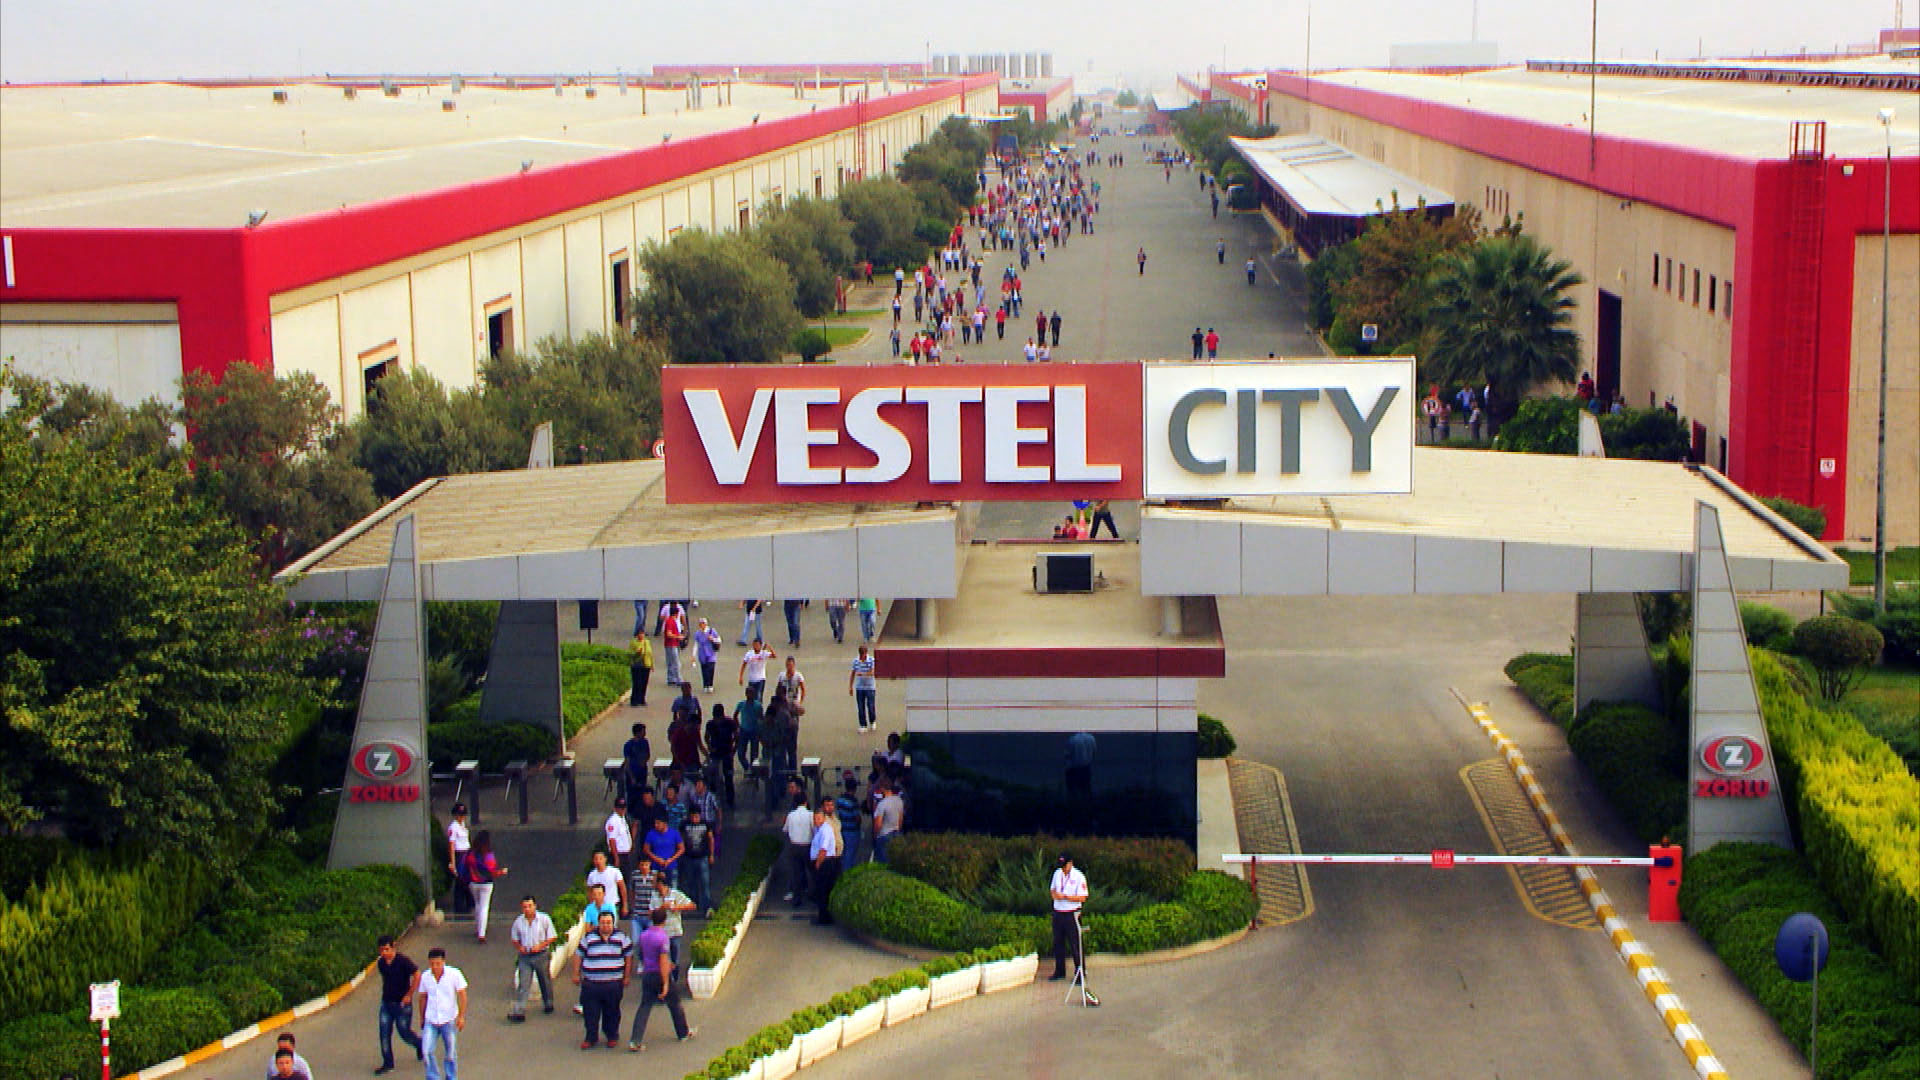 VestelCity.jpg